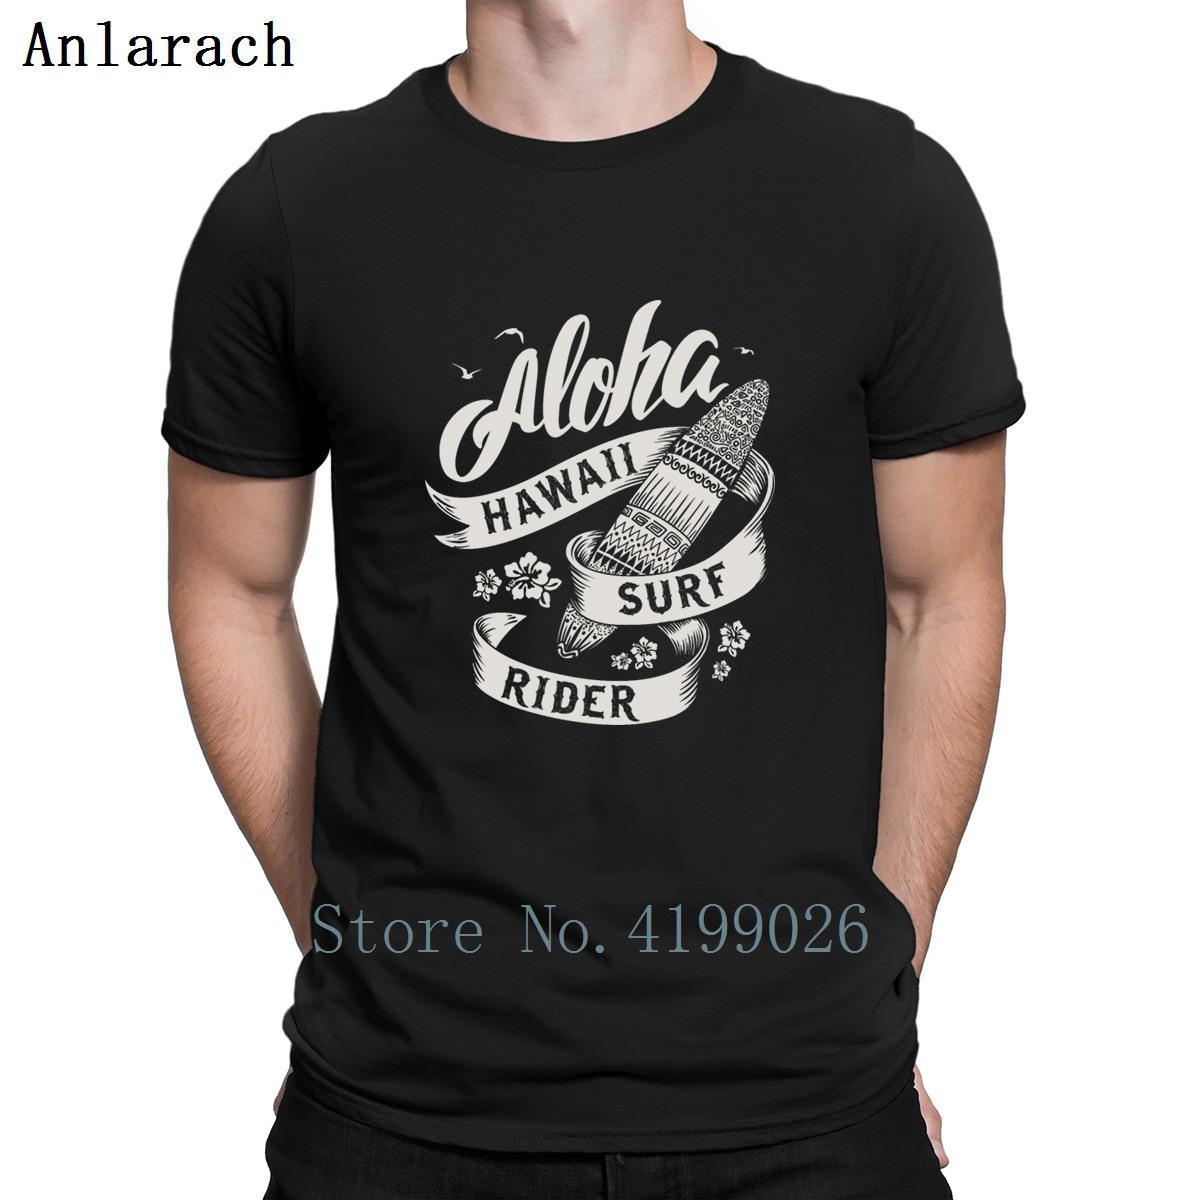 Hawaii Aloha Surfs Rider Tshirts Great Tee Top Одежда Летняя Мужская тенниска подарков O шеи Письмо Anlarach